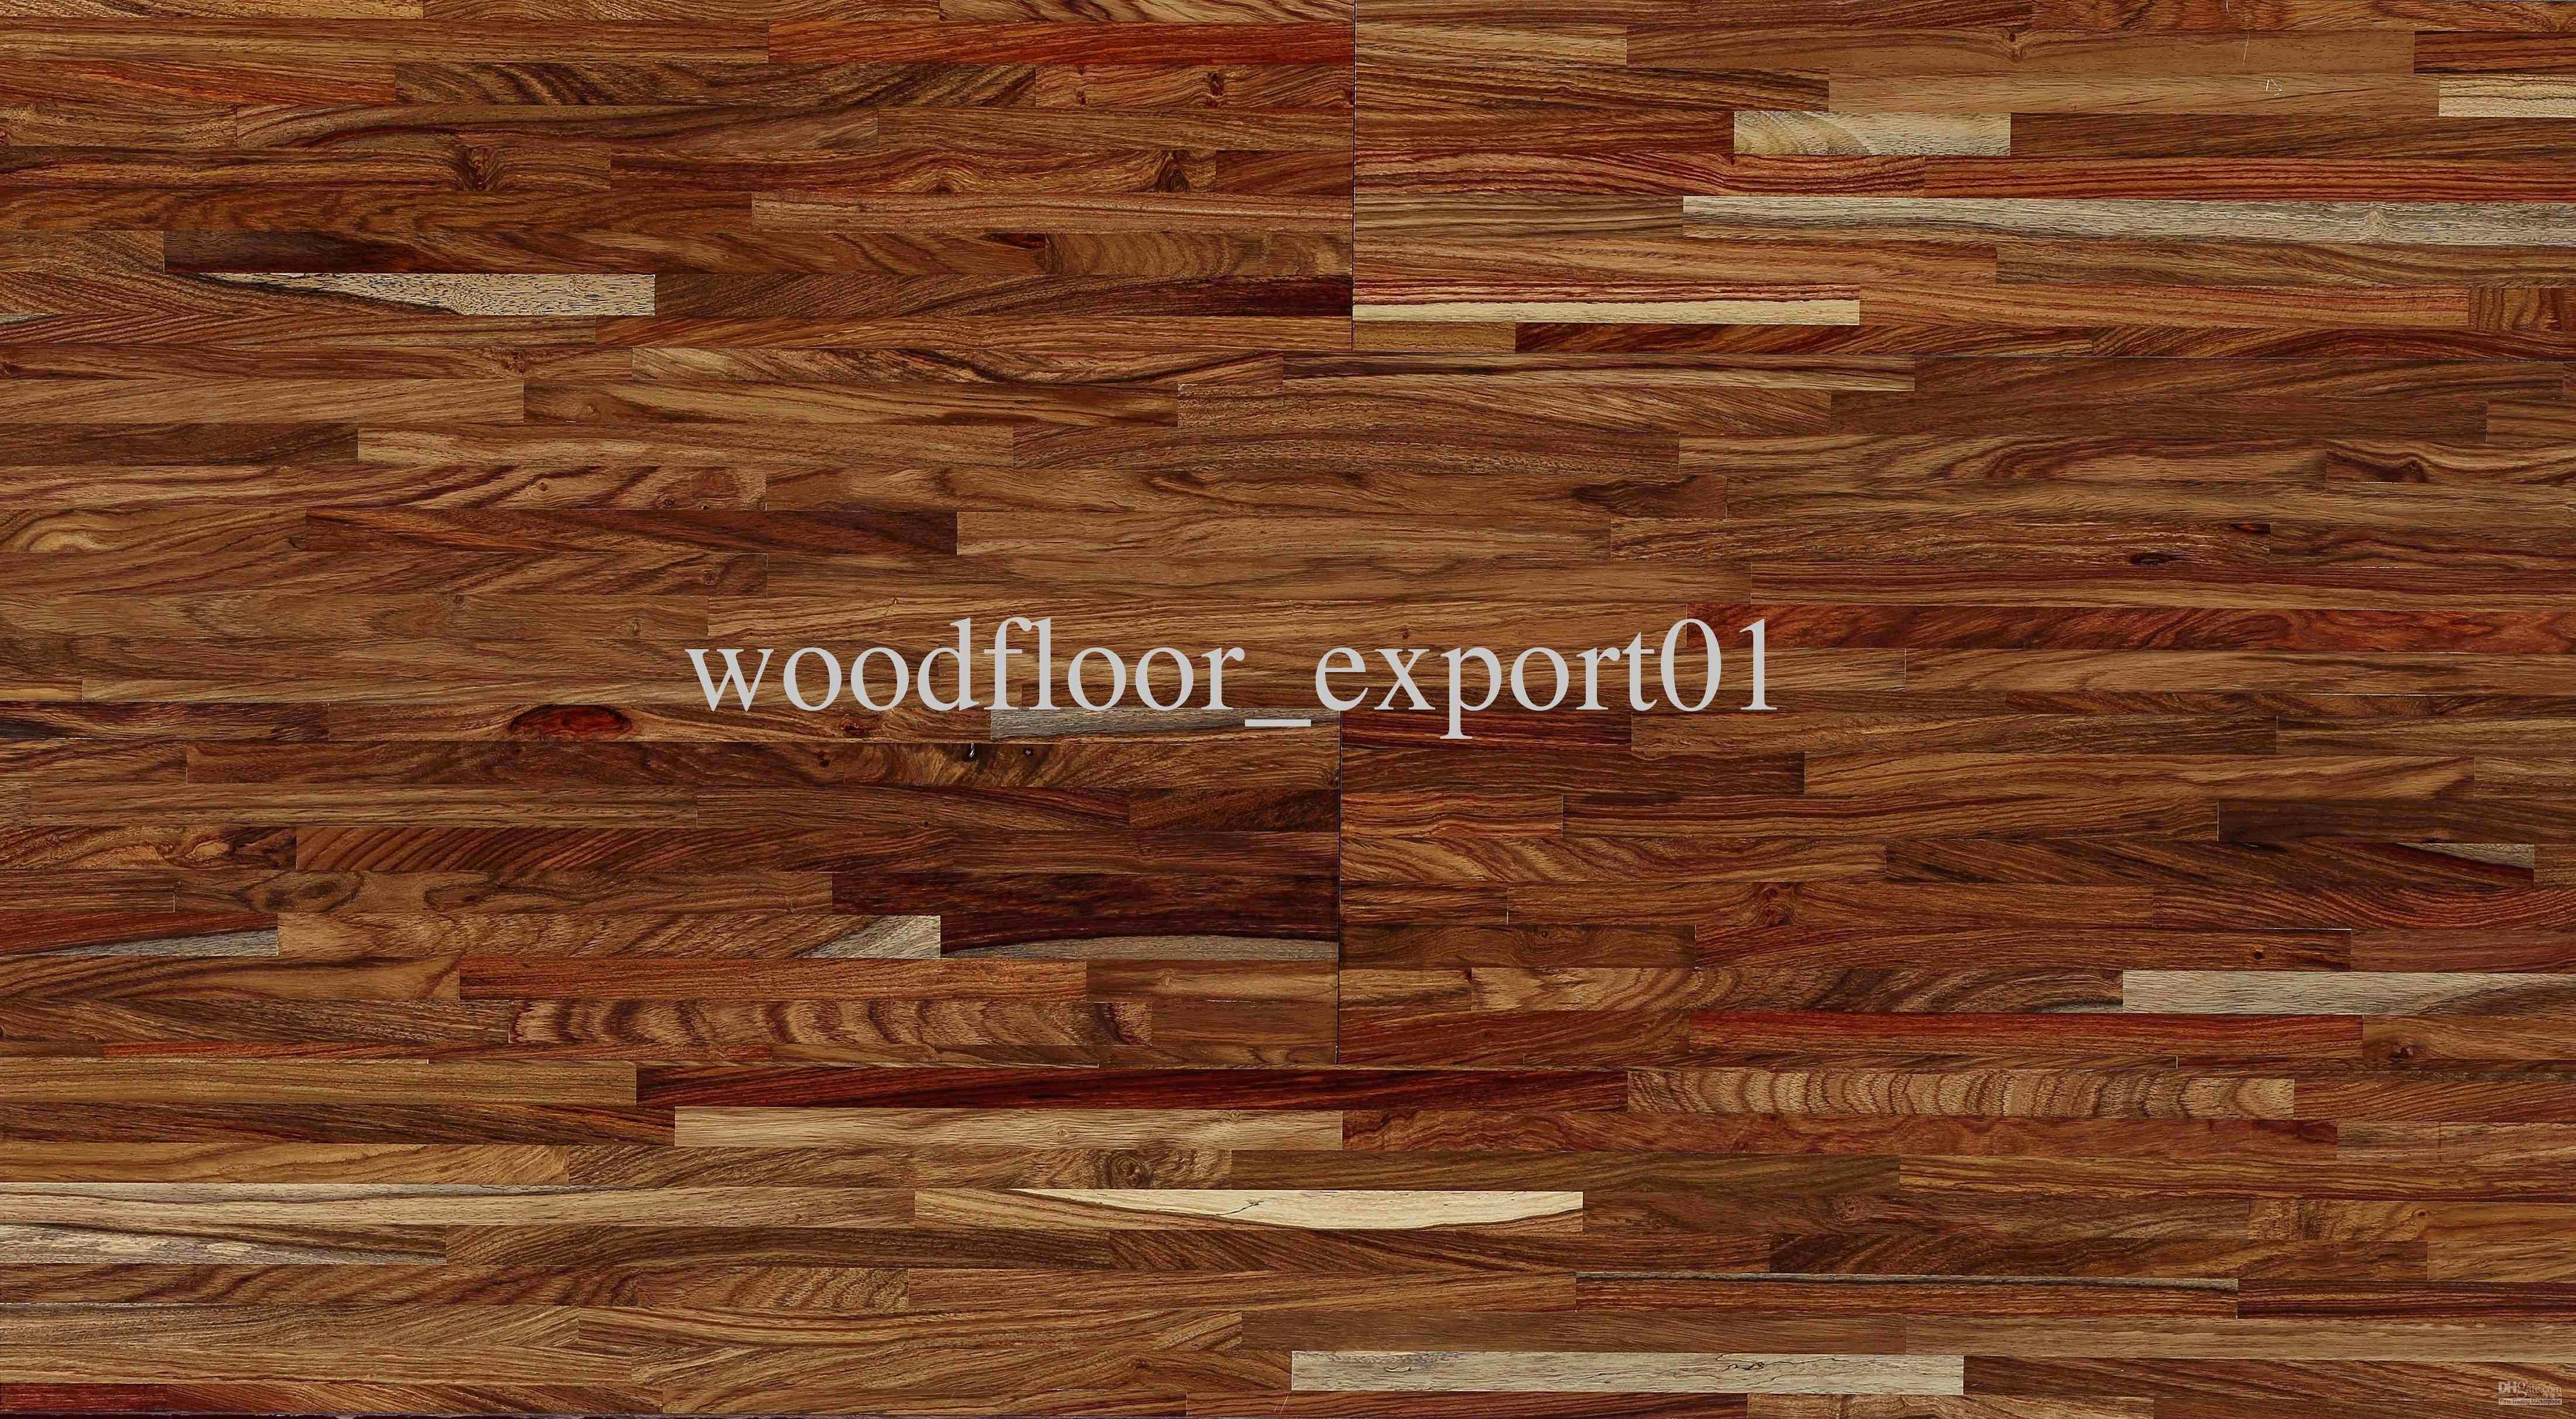 how to replace engineered hardwood floor planks of 17 best of install hardwood floor image dizpos com pertaining to install hardwood floor best of 50 unique hardwood floor installers near me graphics 50 s images